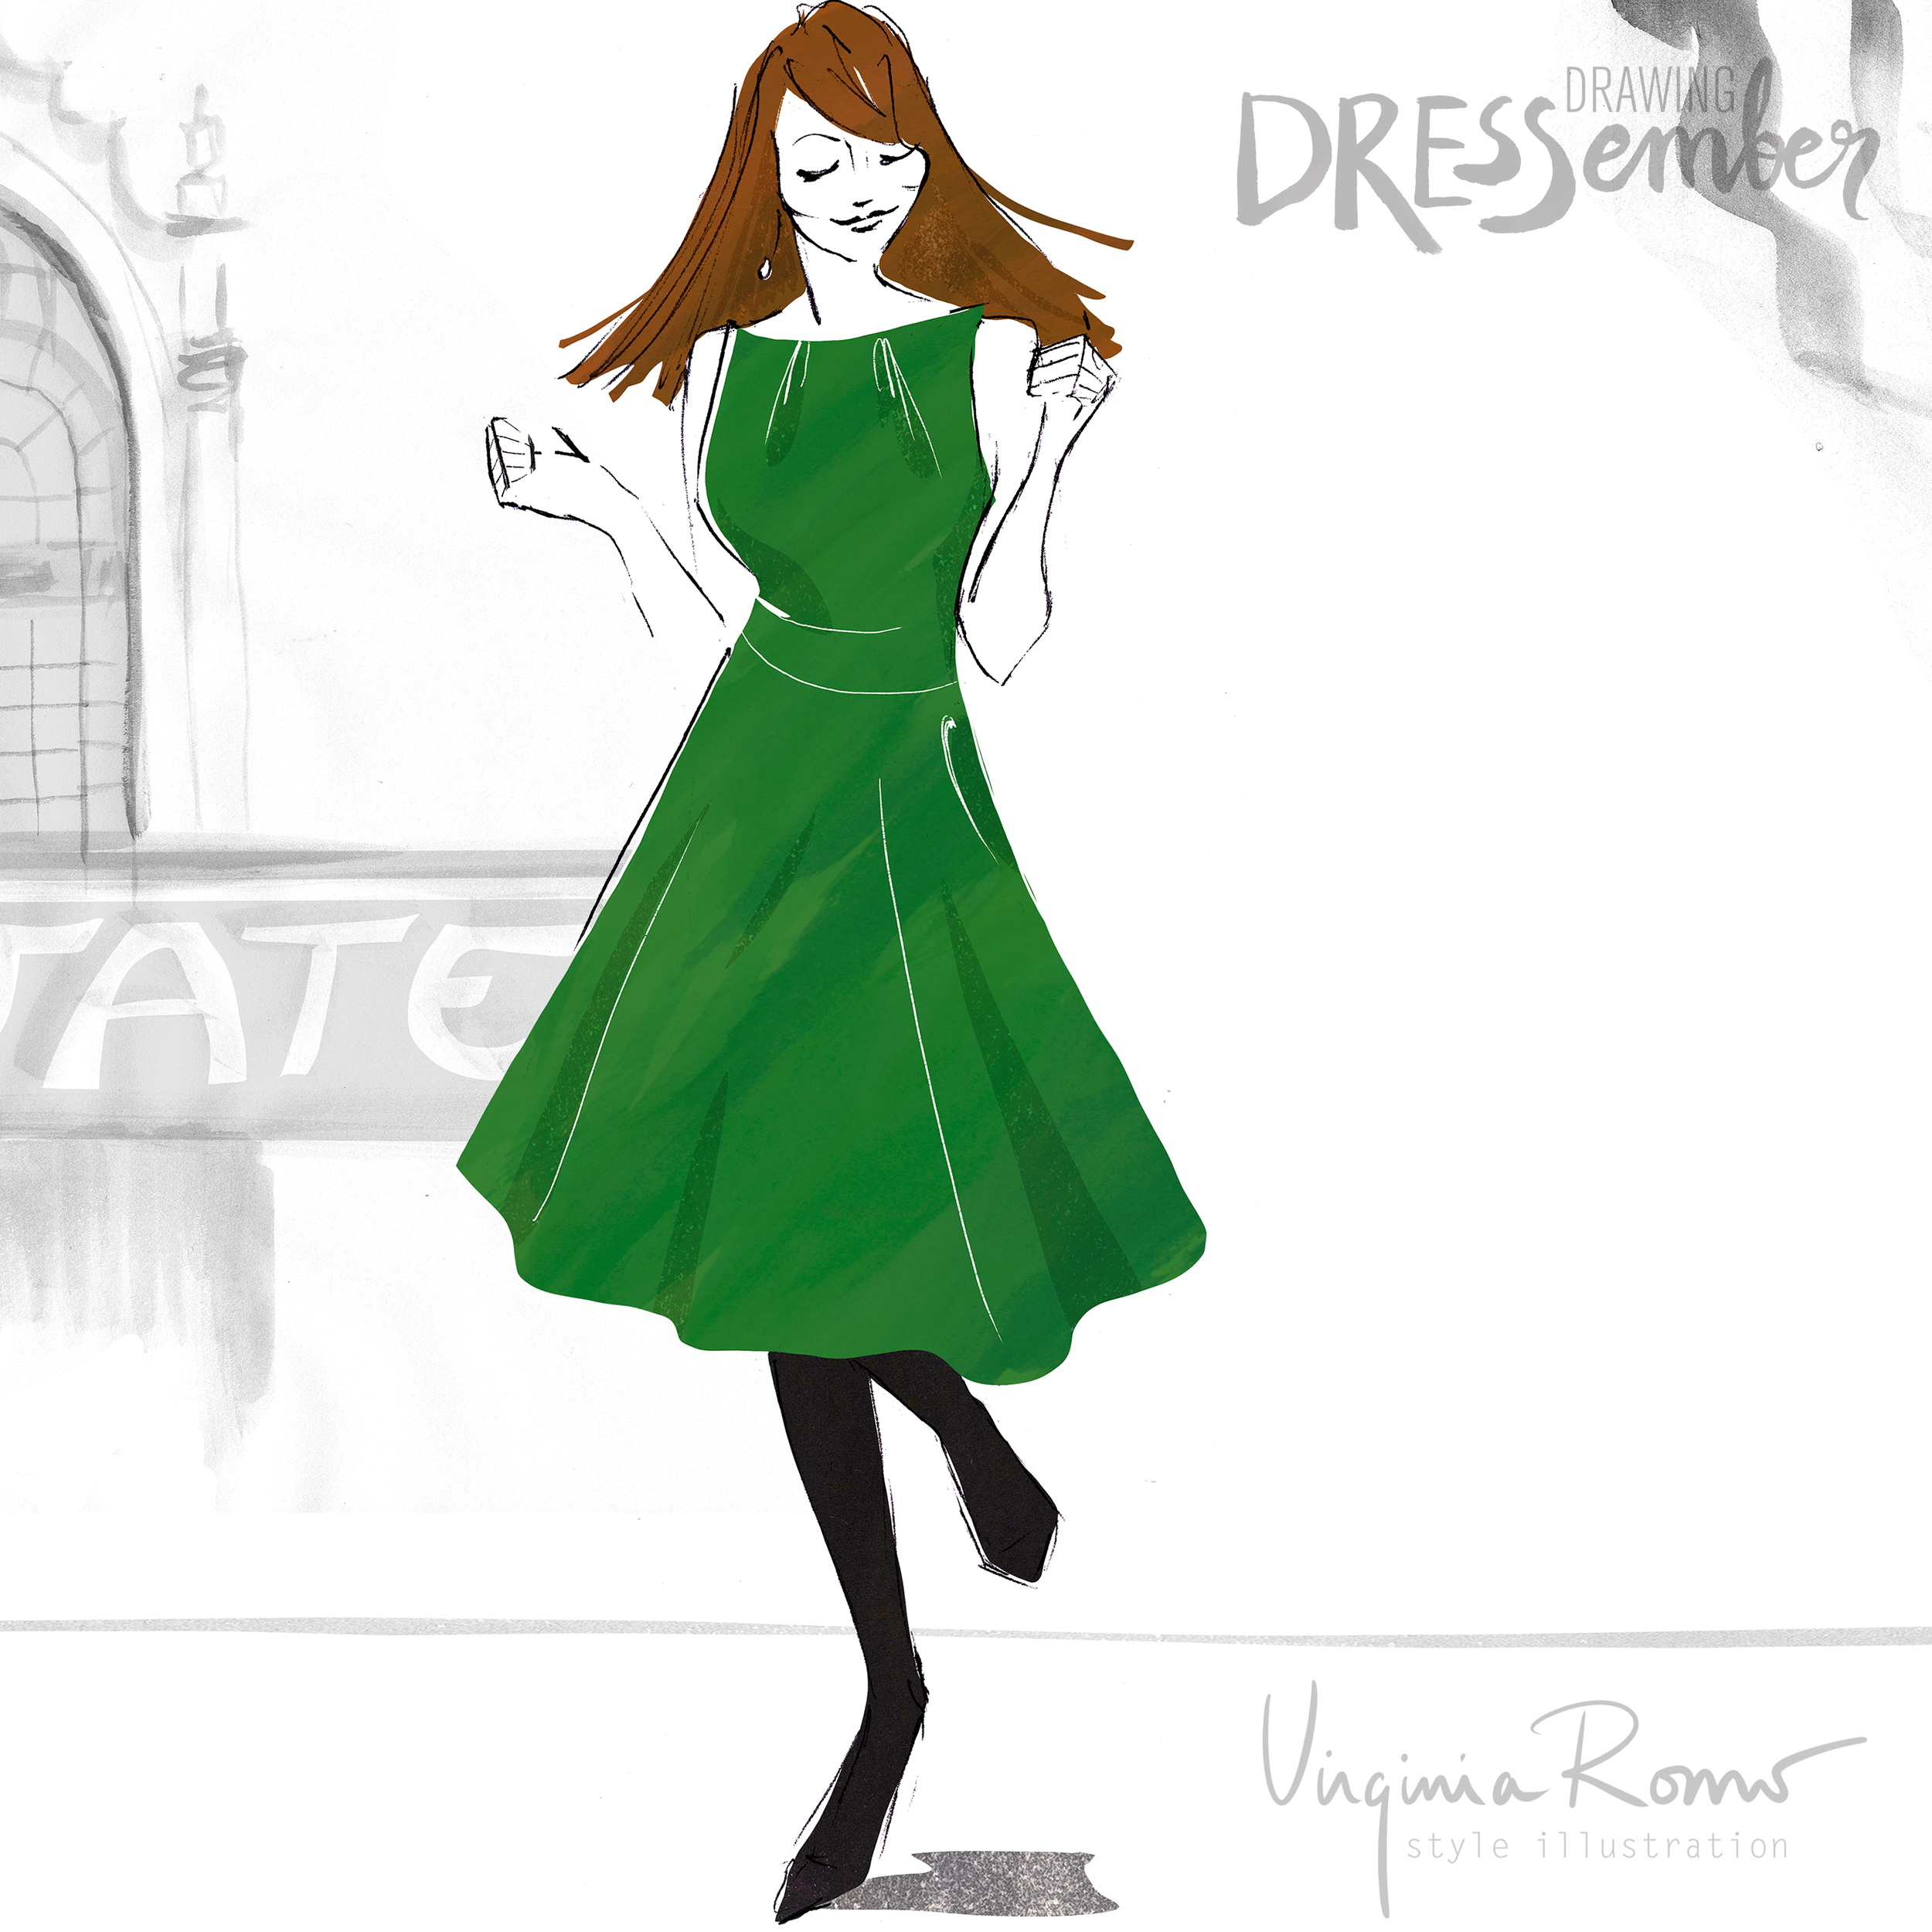 dressember-VirginiaRomoIllustration-03-riddell-IG.jpg